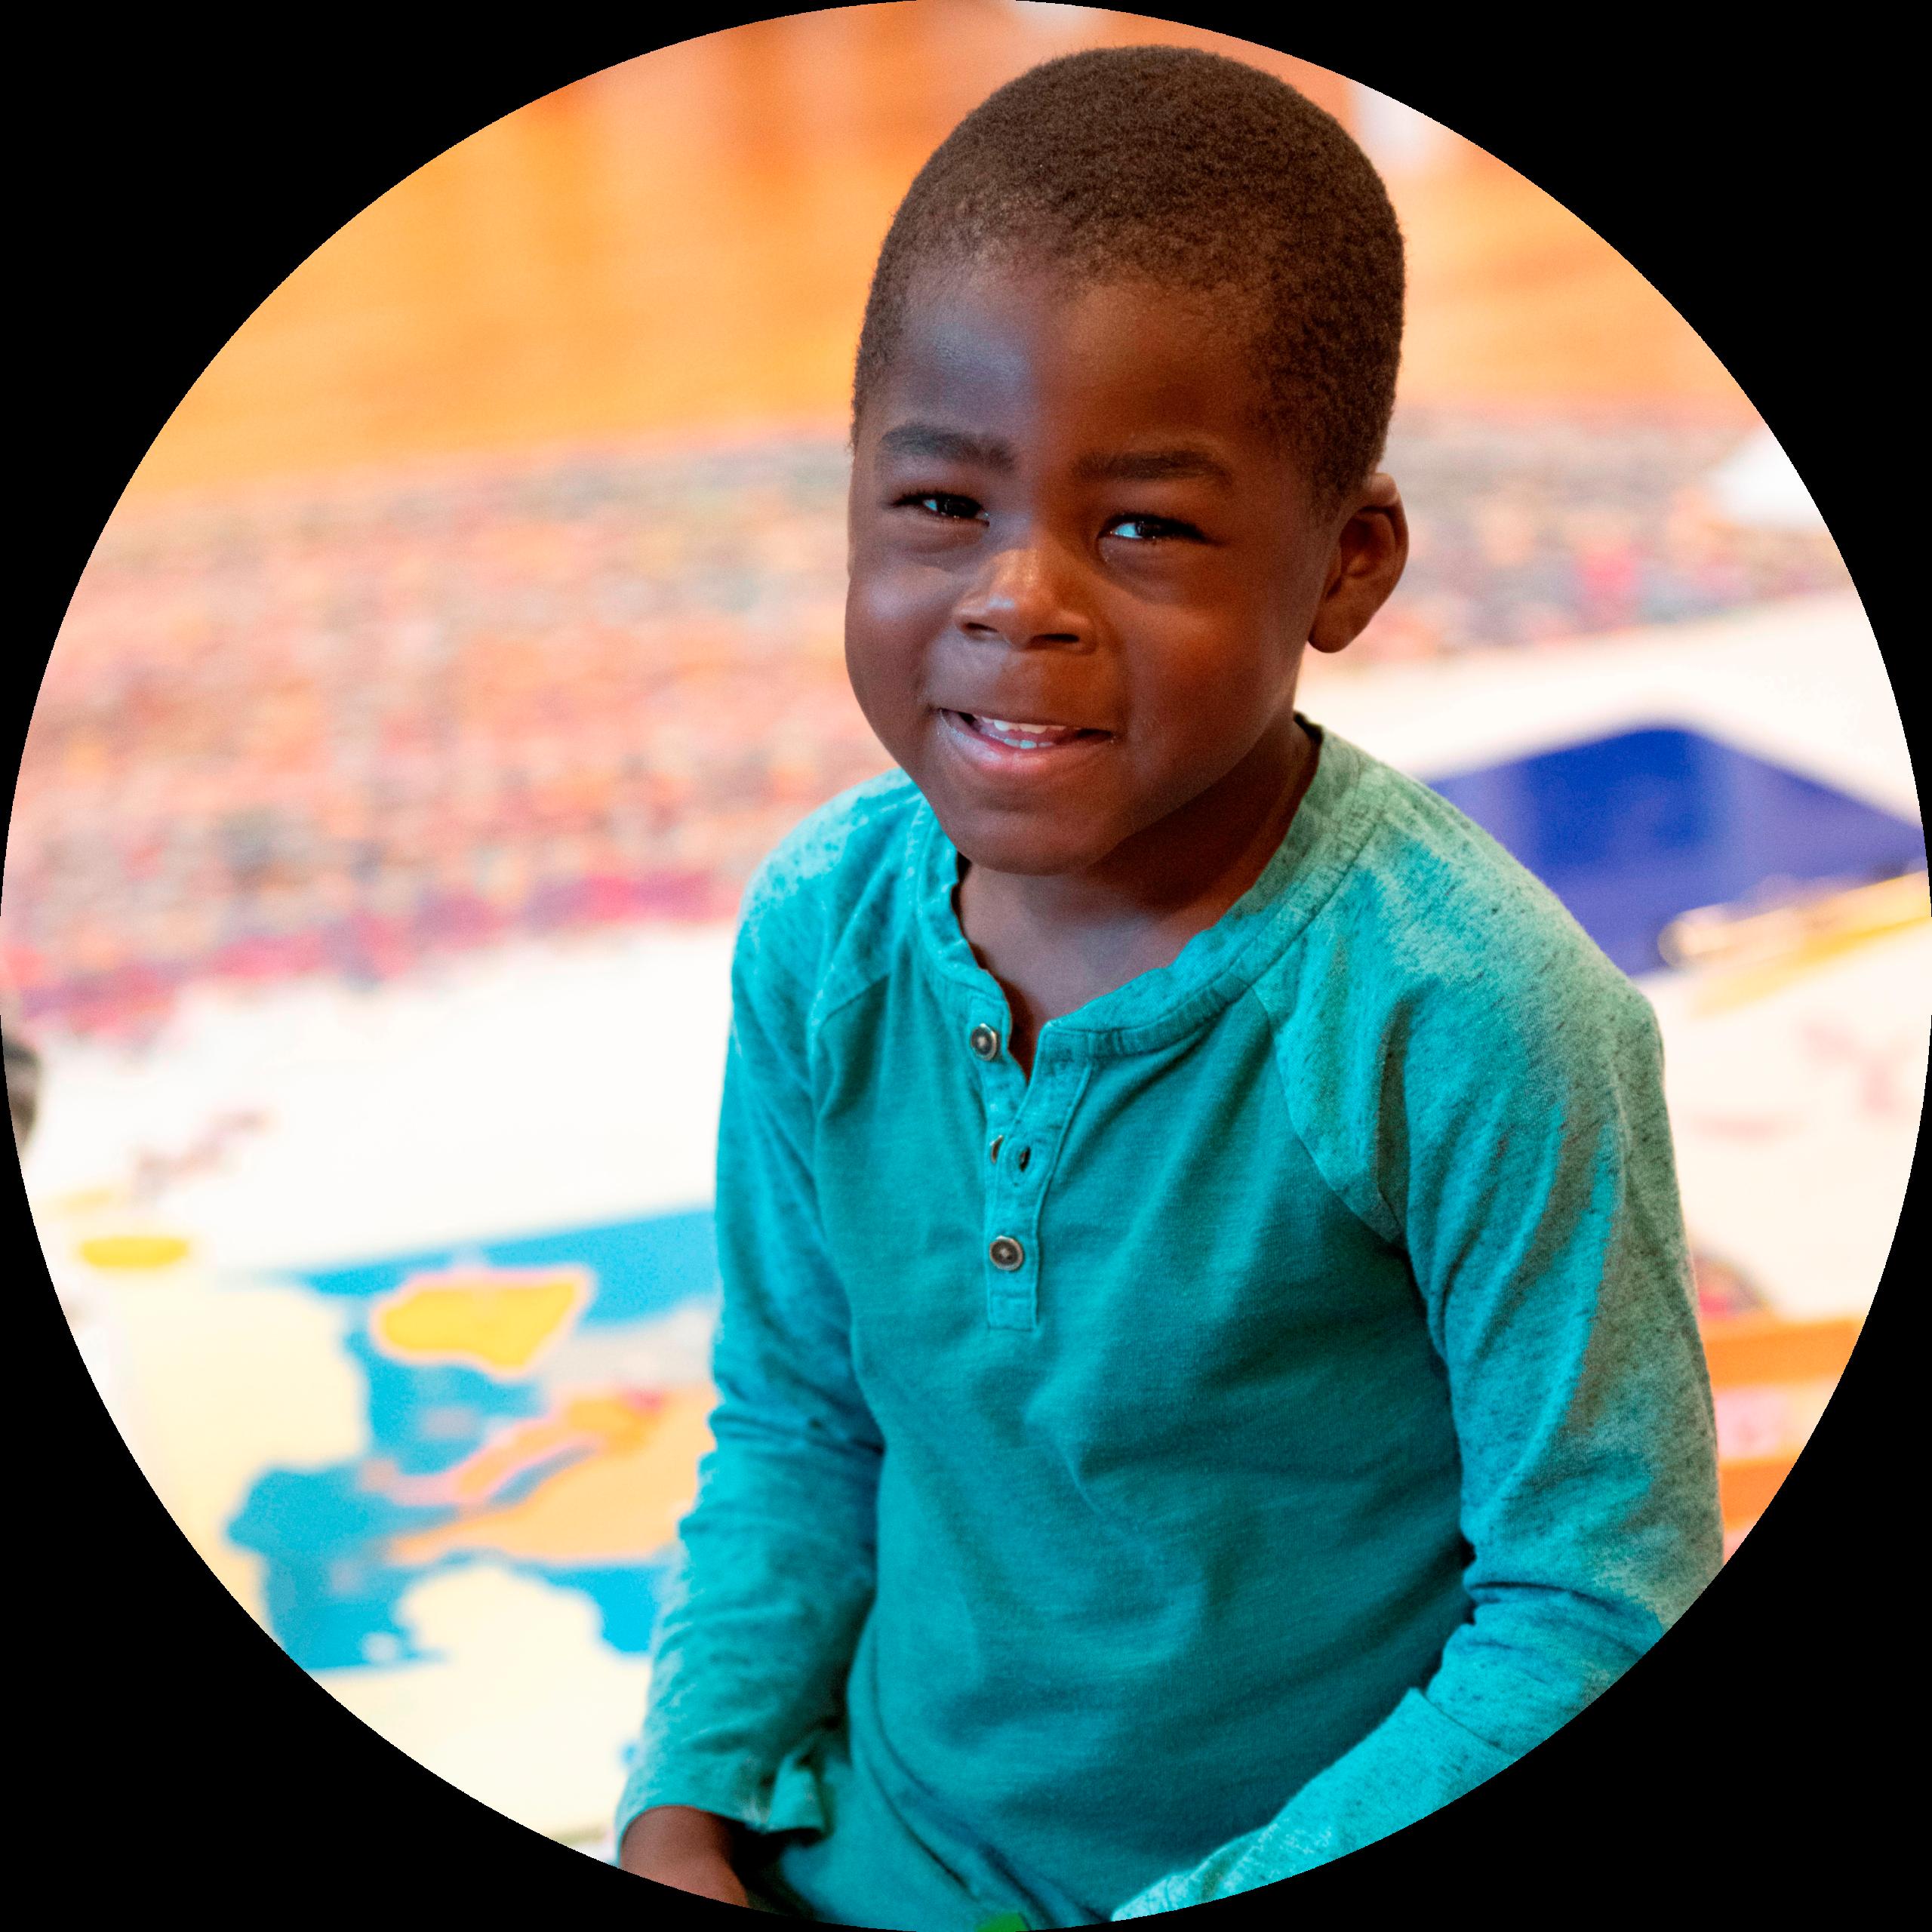 Smiling Primary Montessori Child